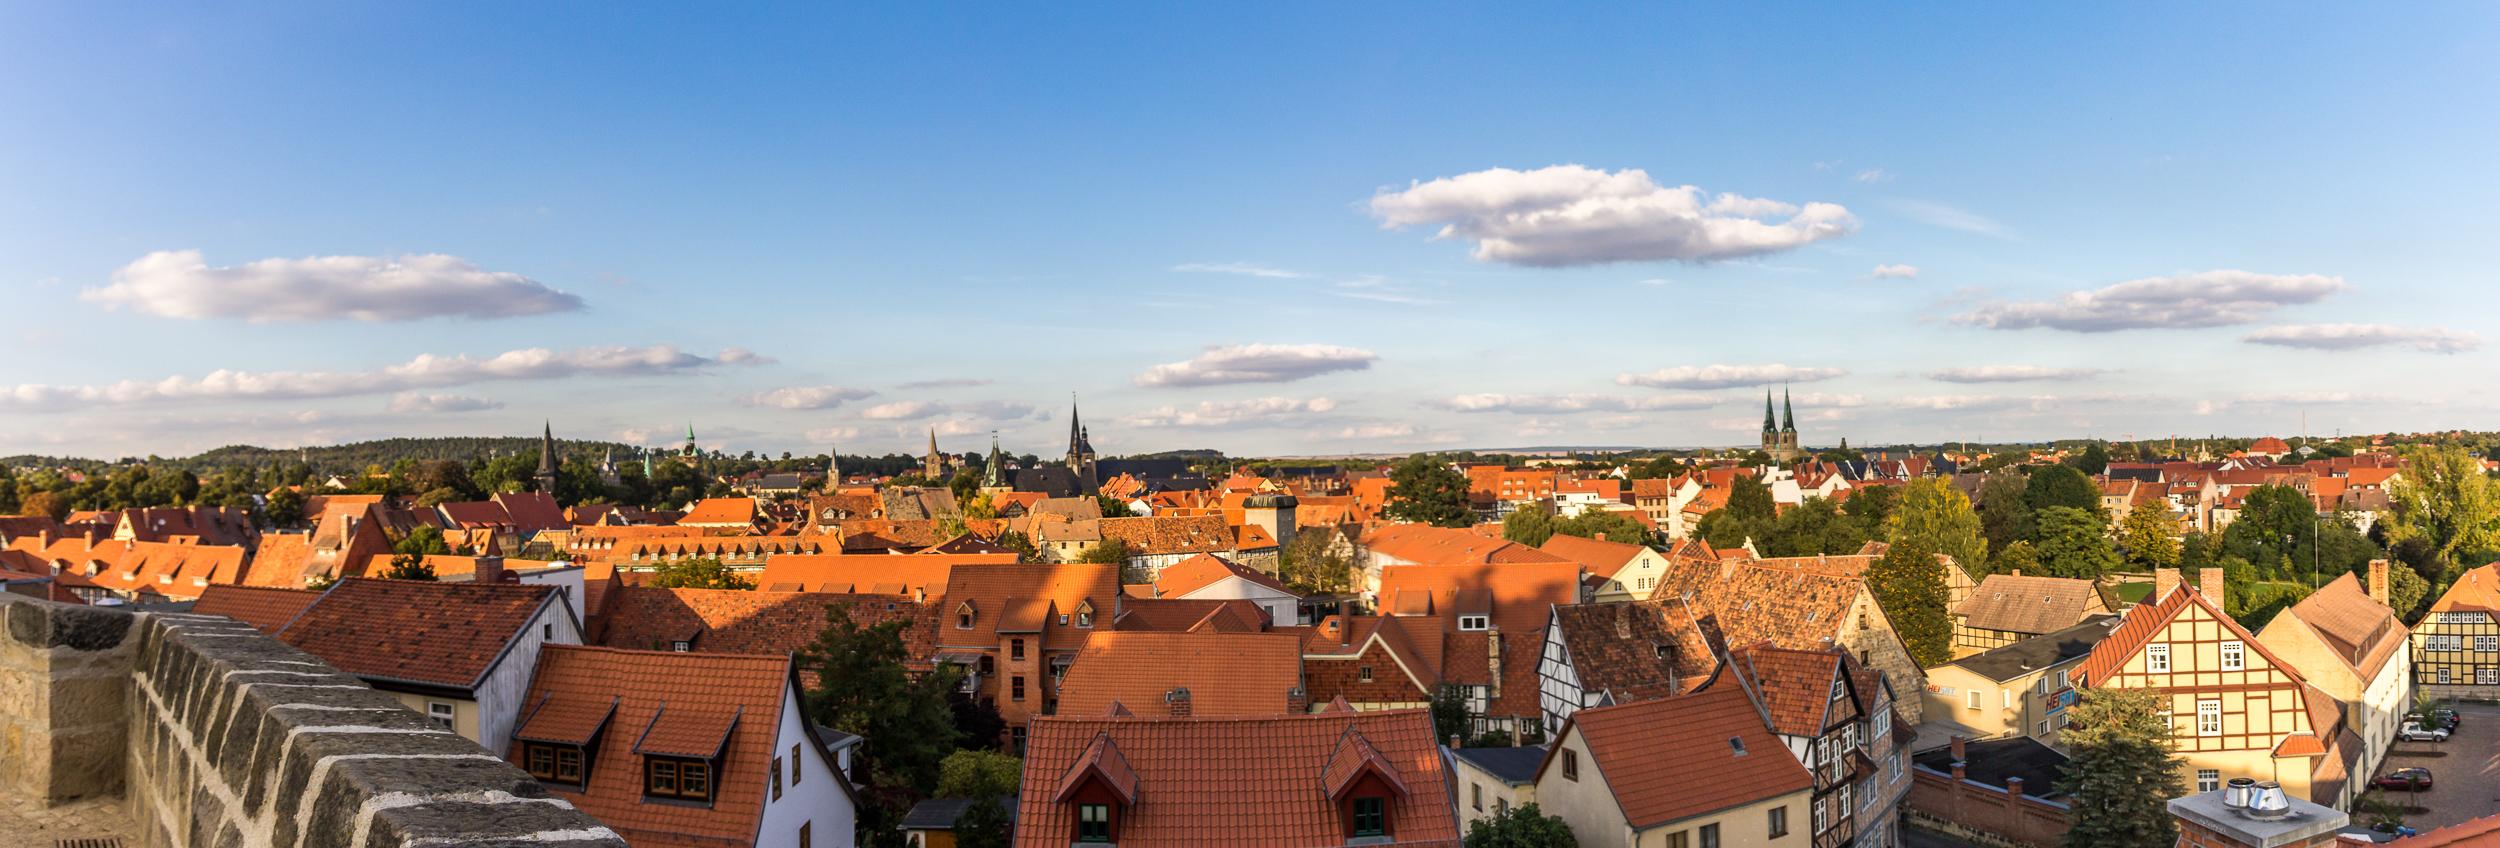 Blick vom Schloss über Quedlinburg